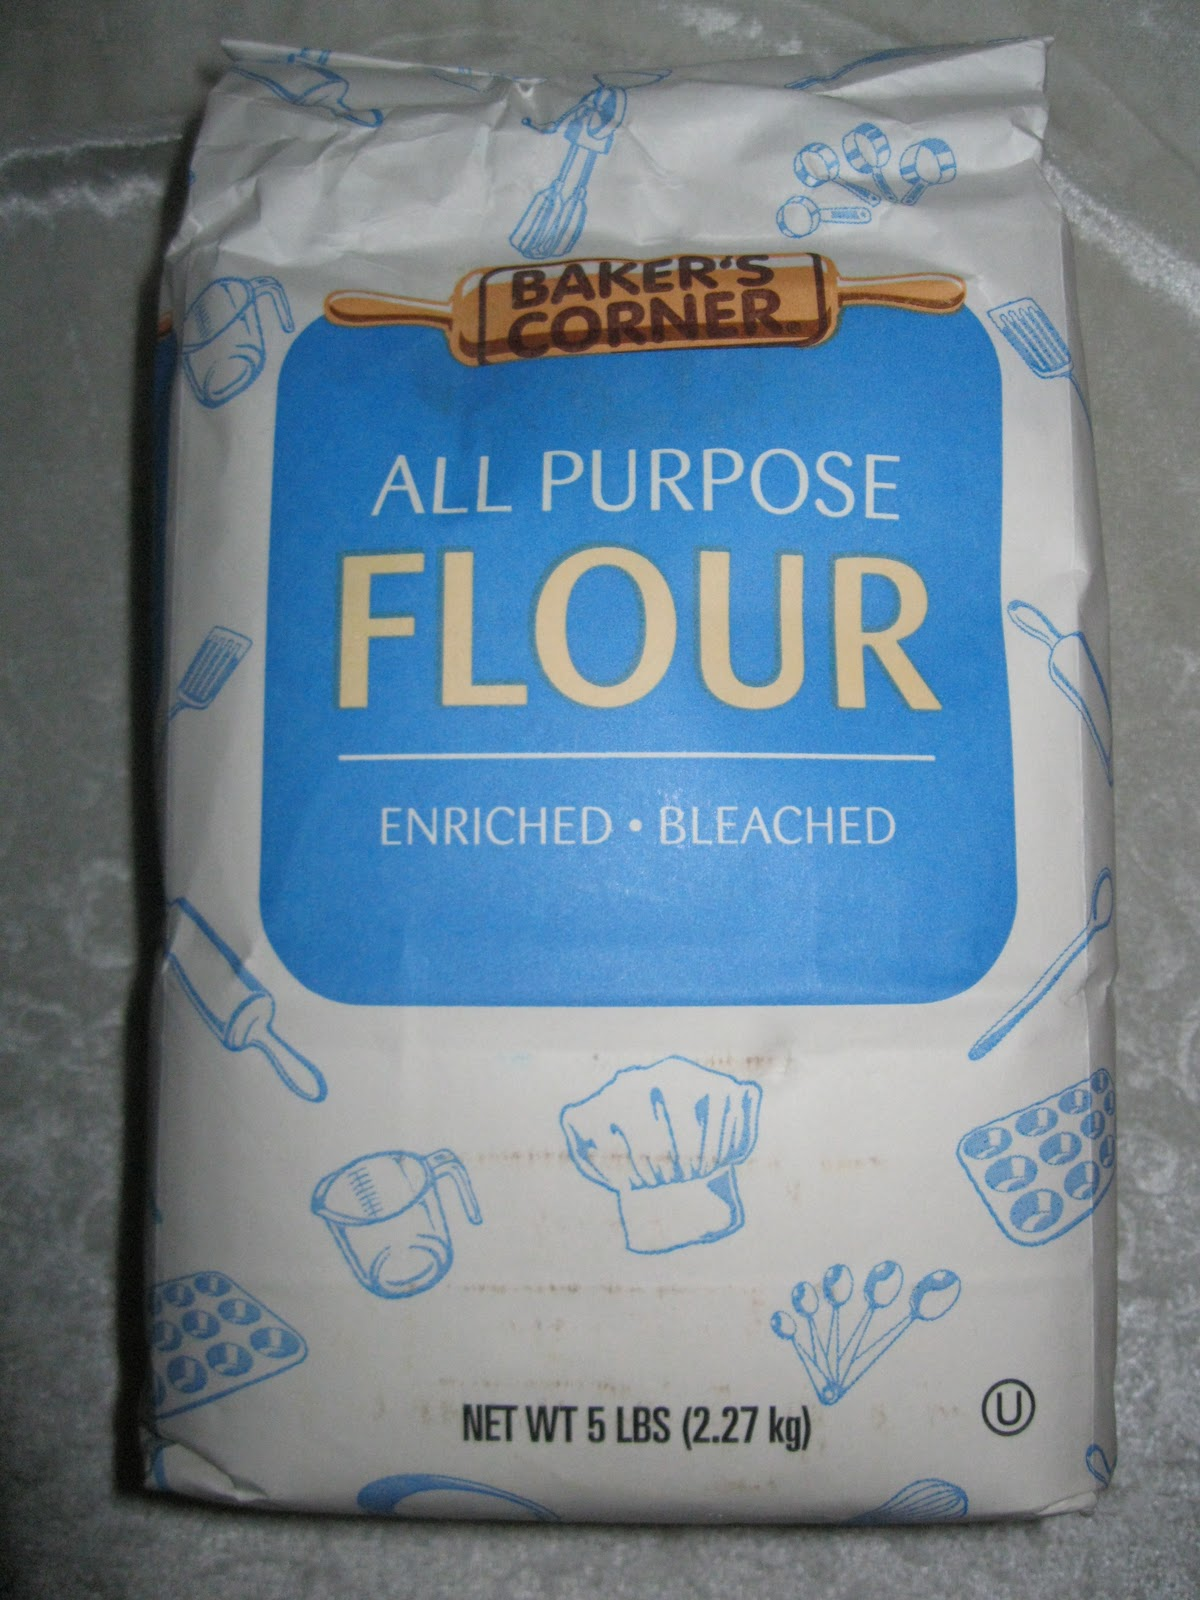 The Aldi Spot - Helping You Save: Aldi Product Review: Aldi Flour ...